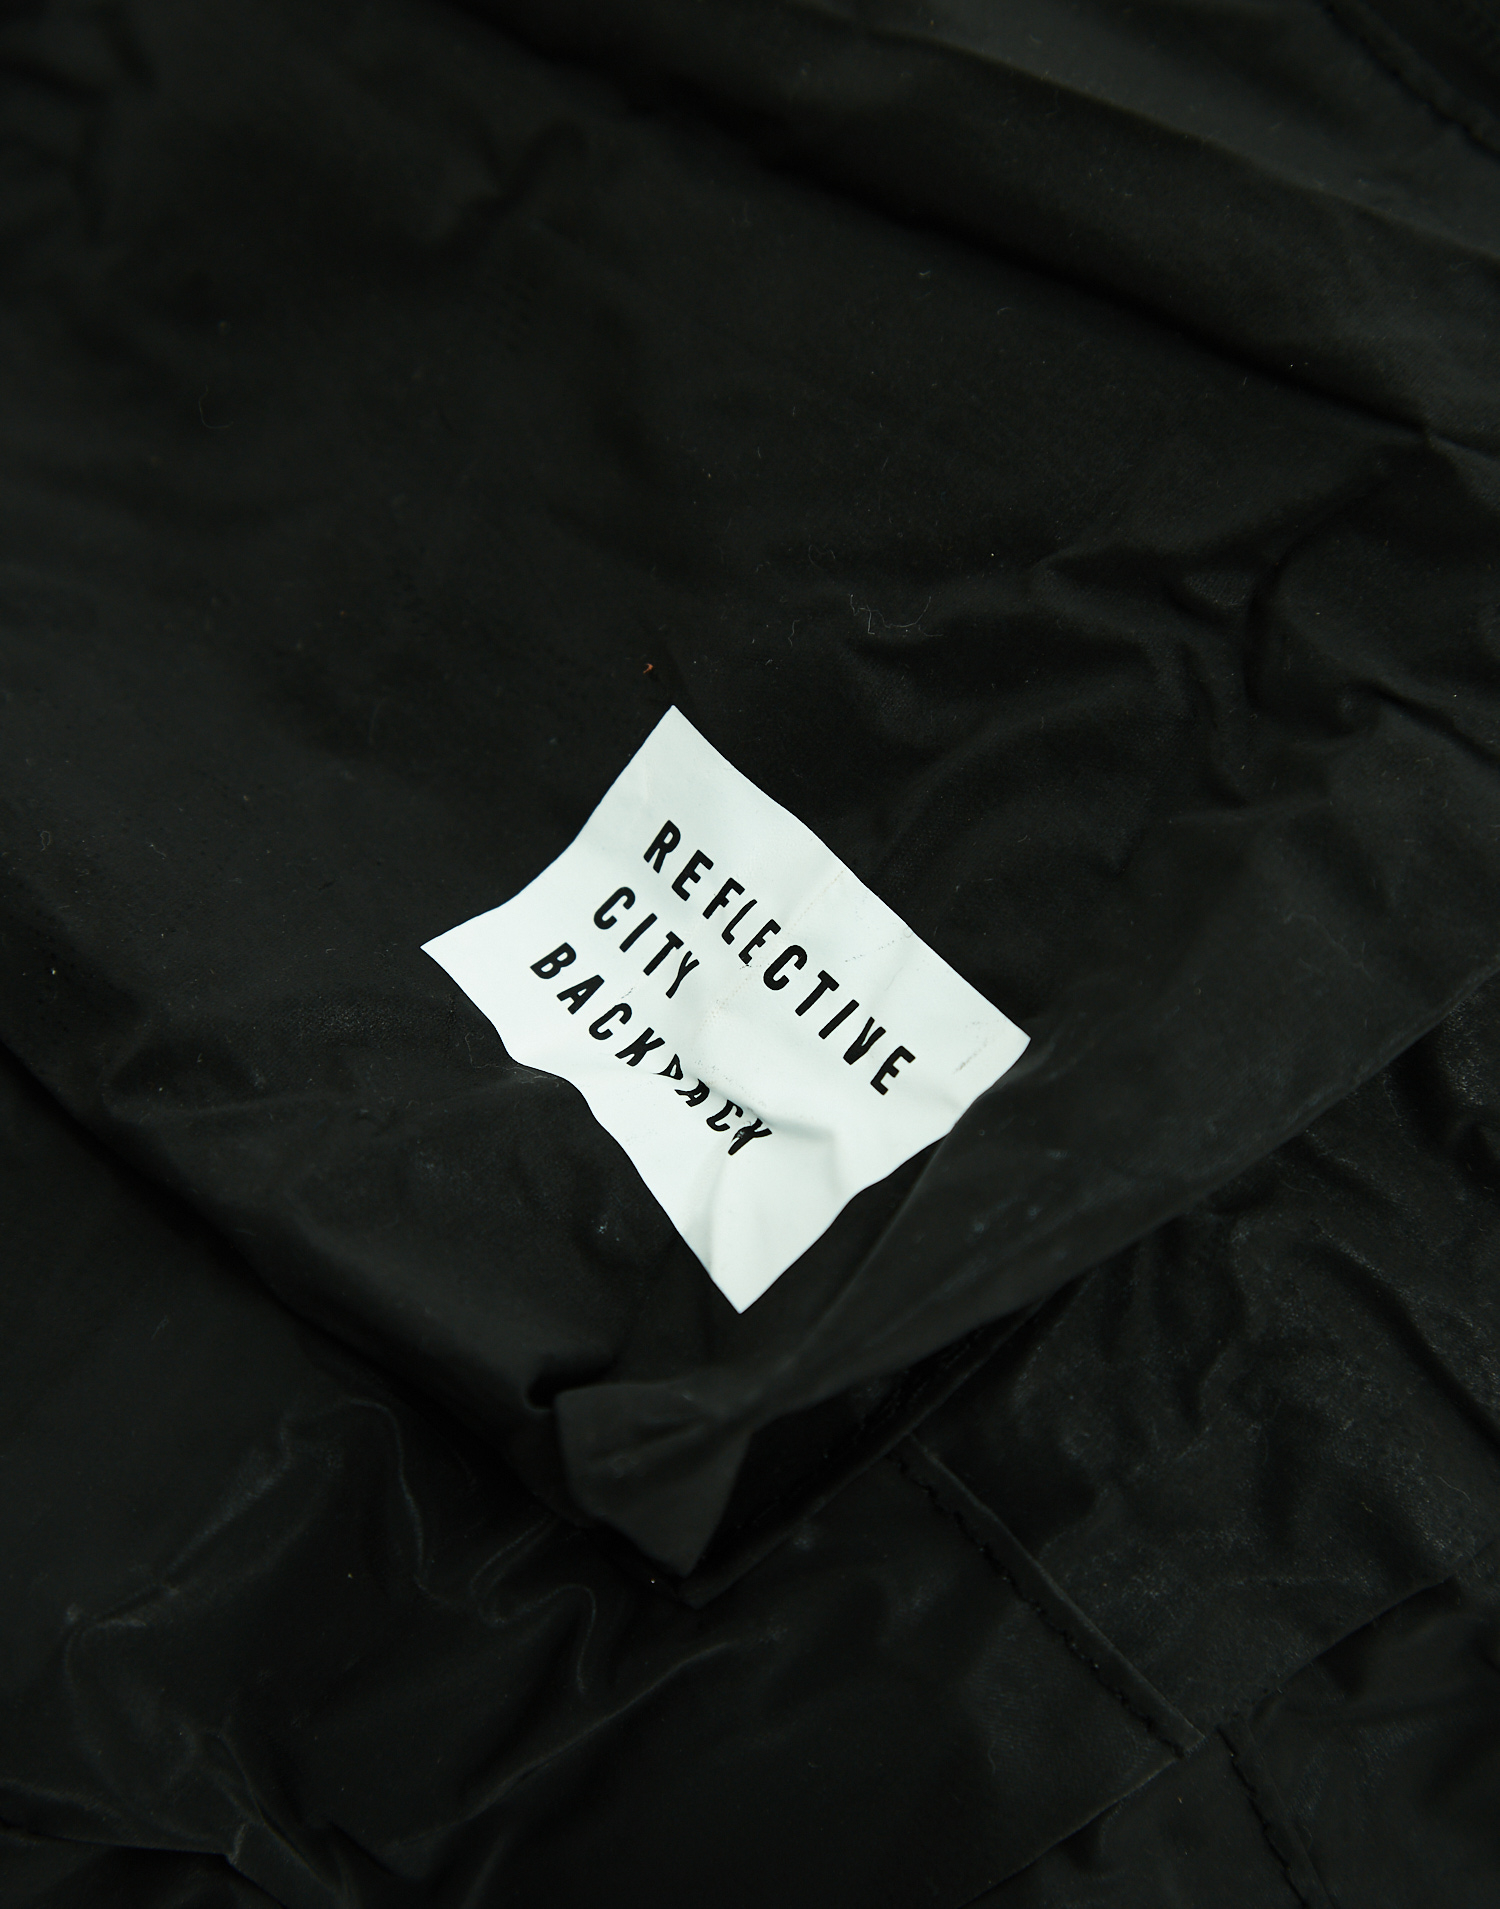 Foldable reflective backpack